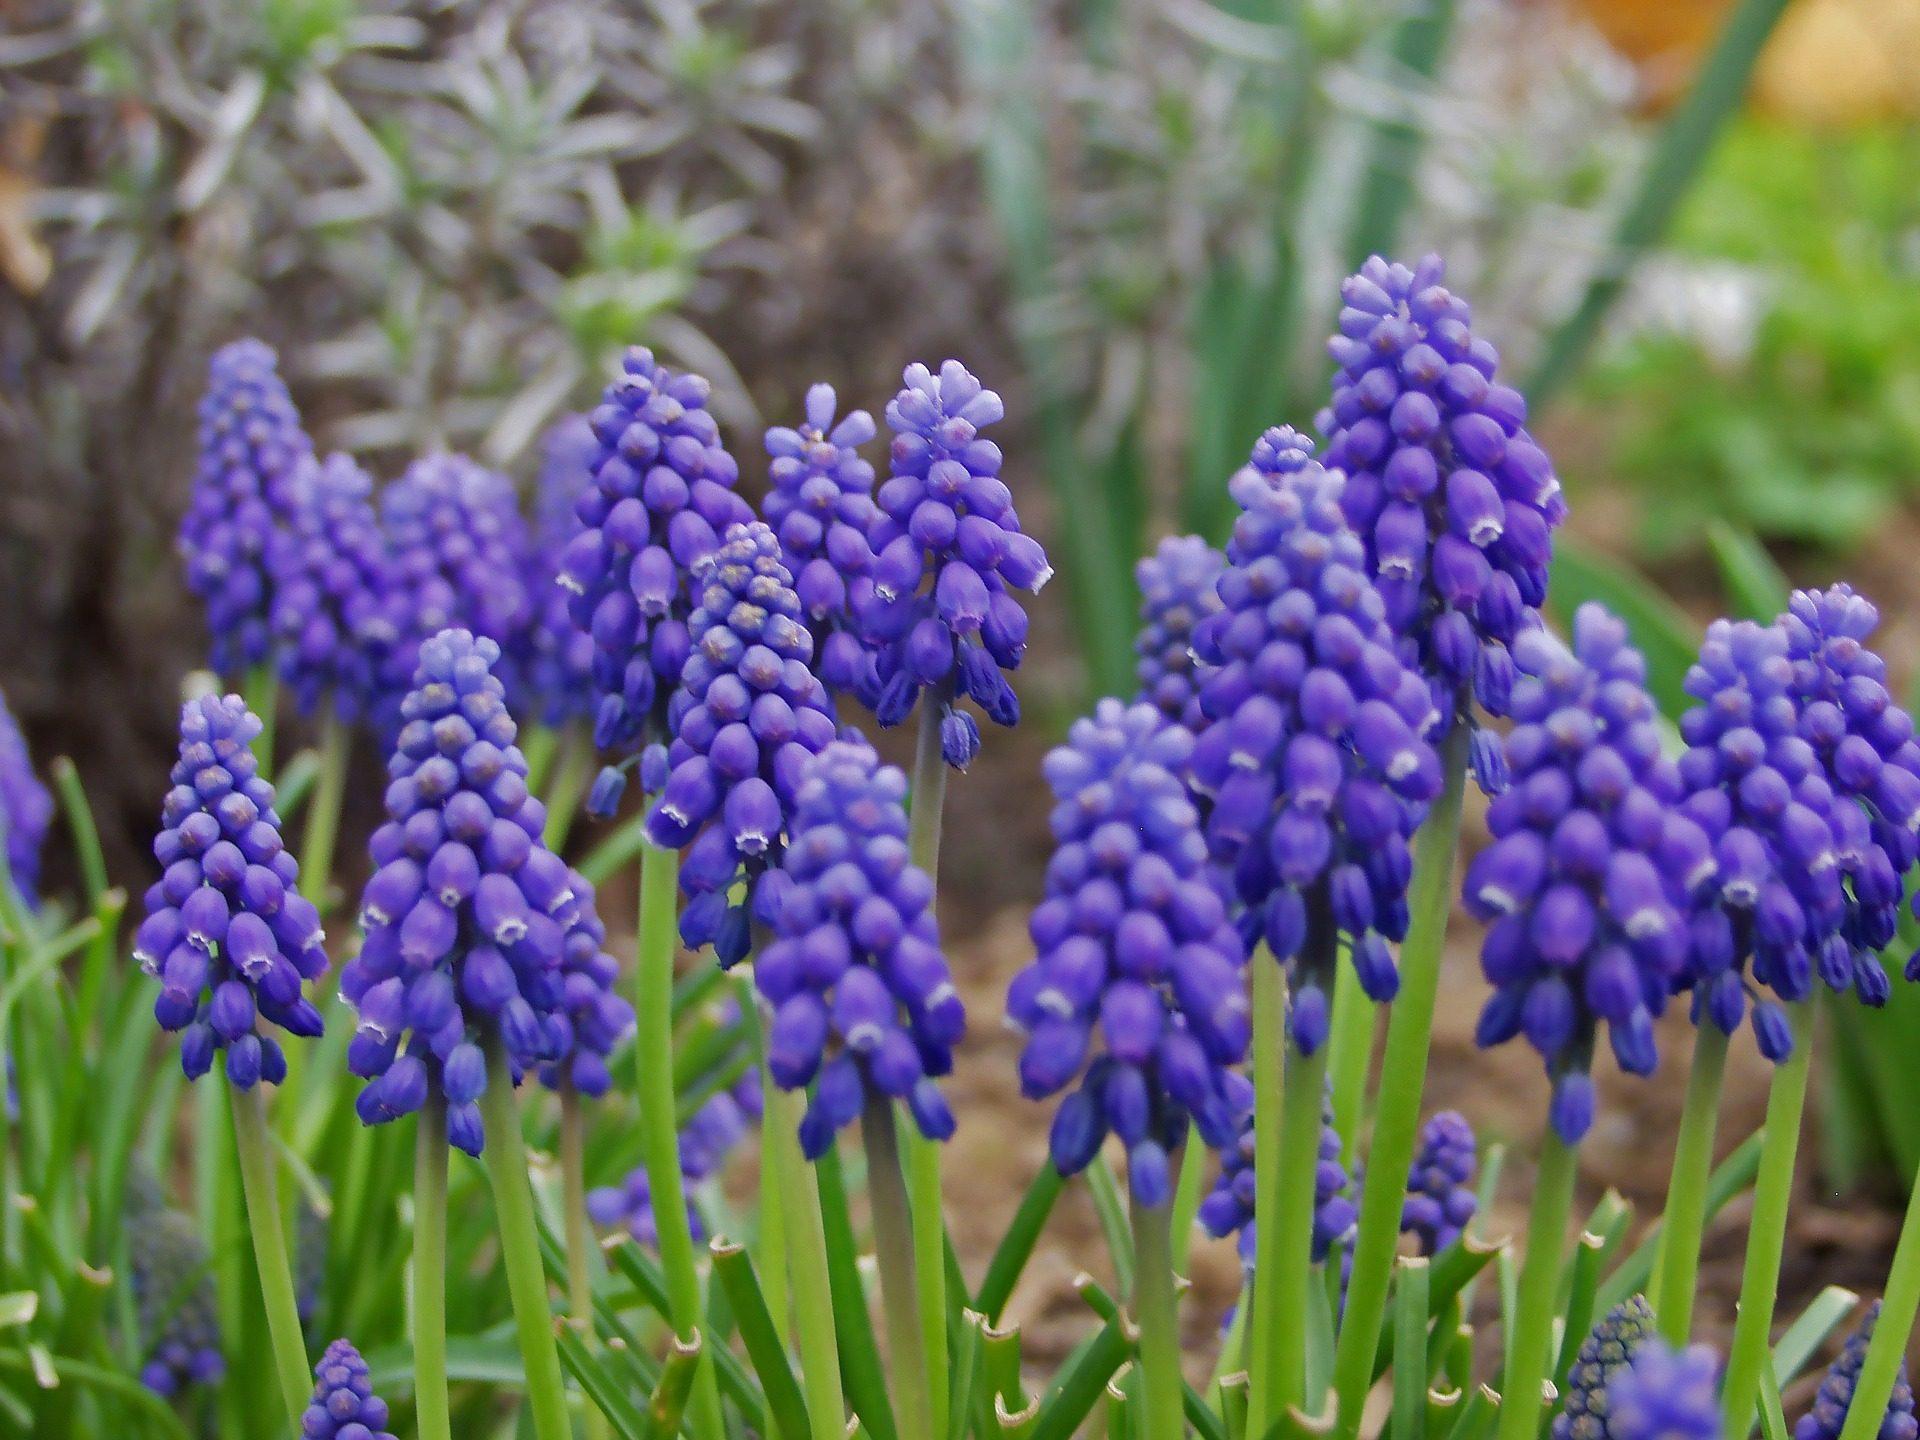 Jacinto, uva, flores, Jardim, Violet, caules - Papéis de parede HD - Professor-falken.com